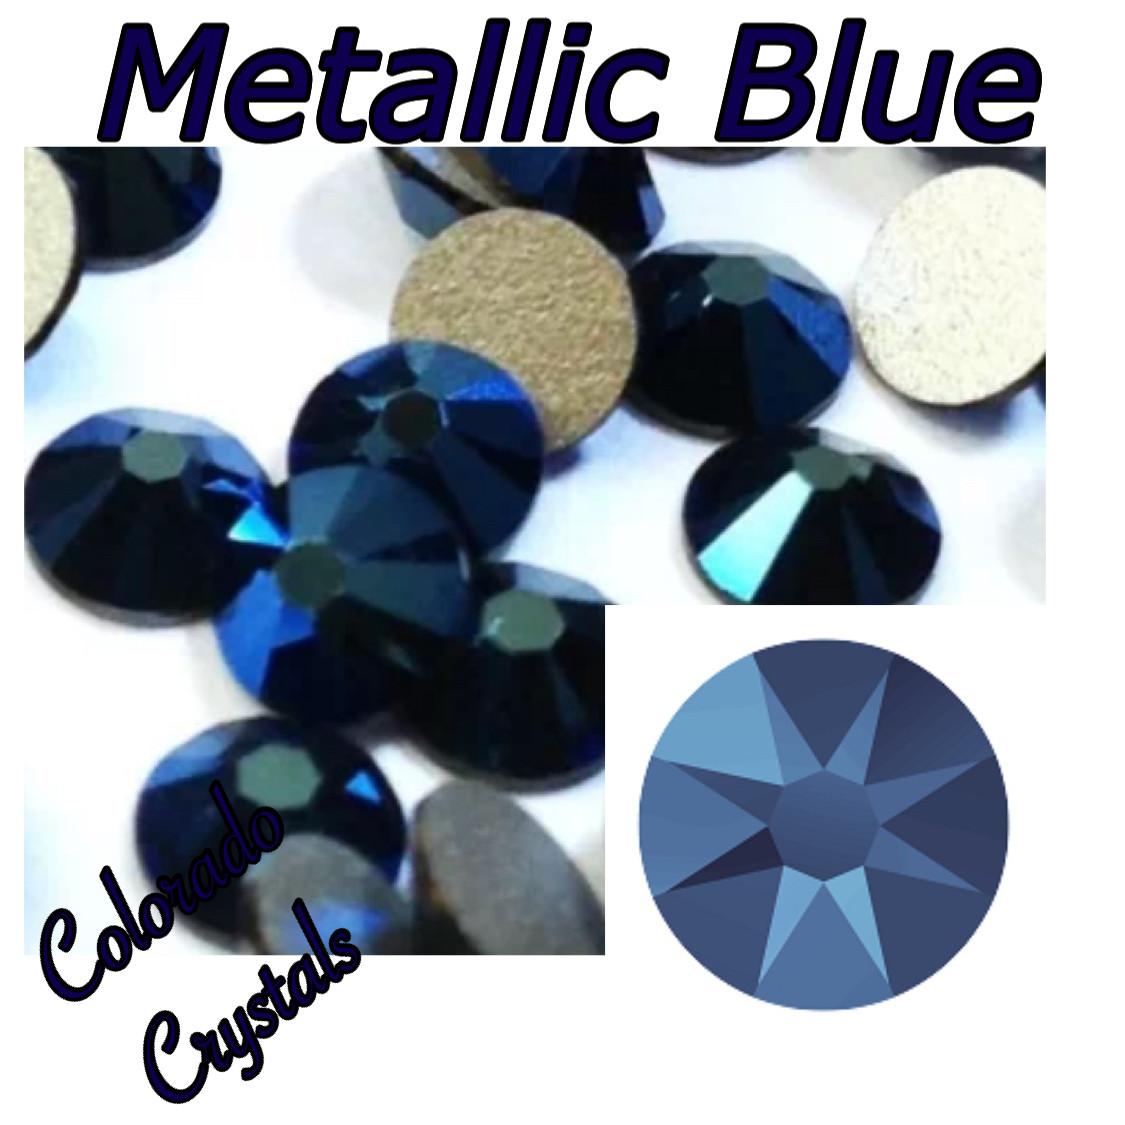 Metallic Blue (Crystal) 12ss 2088